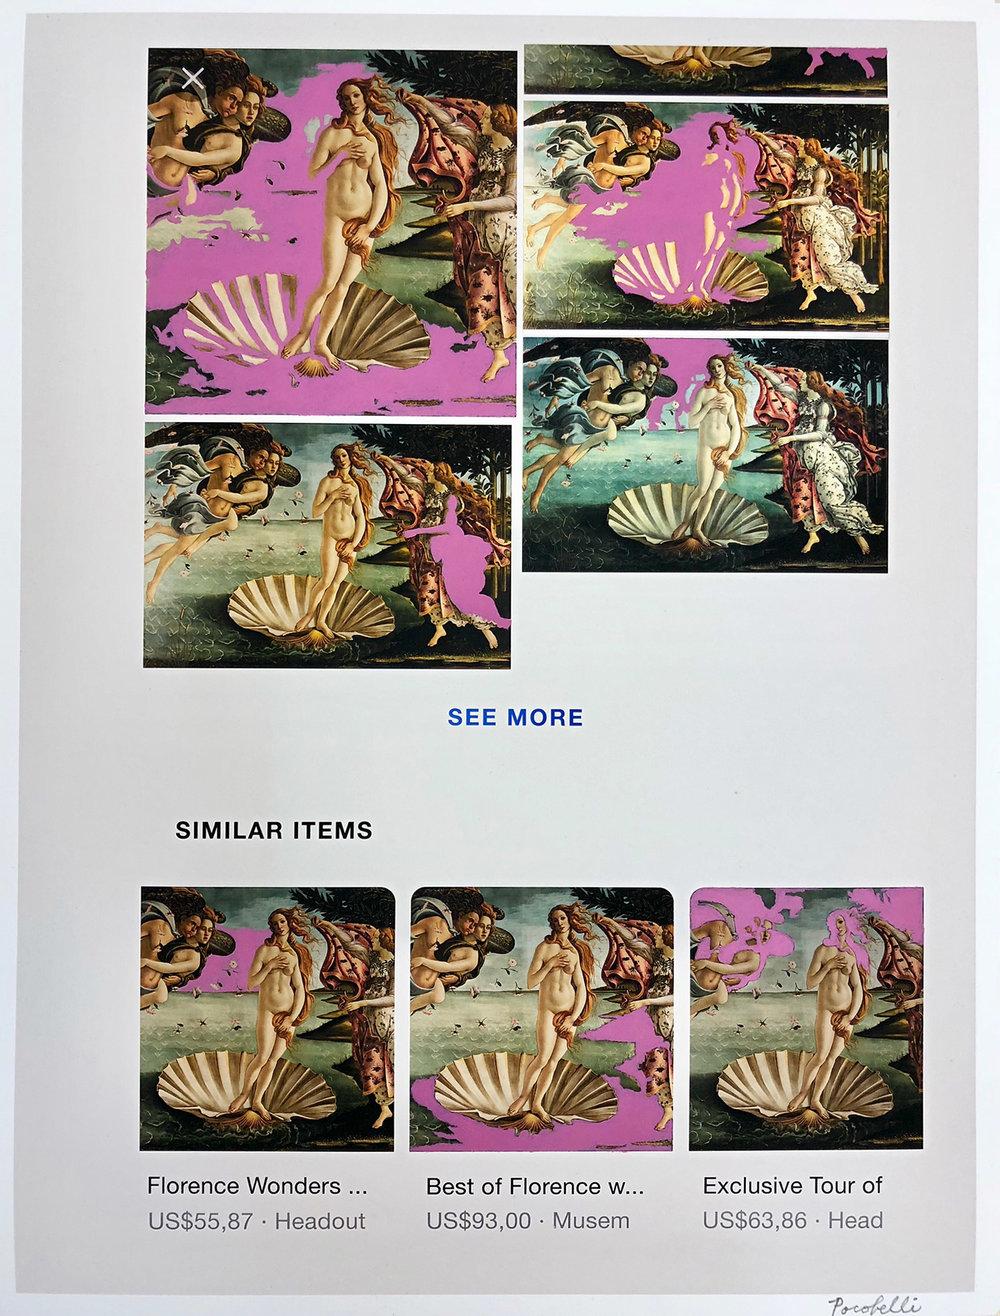 """q=birth+of+venus"", 35 cm x 46 cm, inkjet and acrylic paint on hahnemuhle paper."